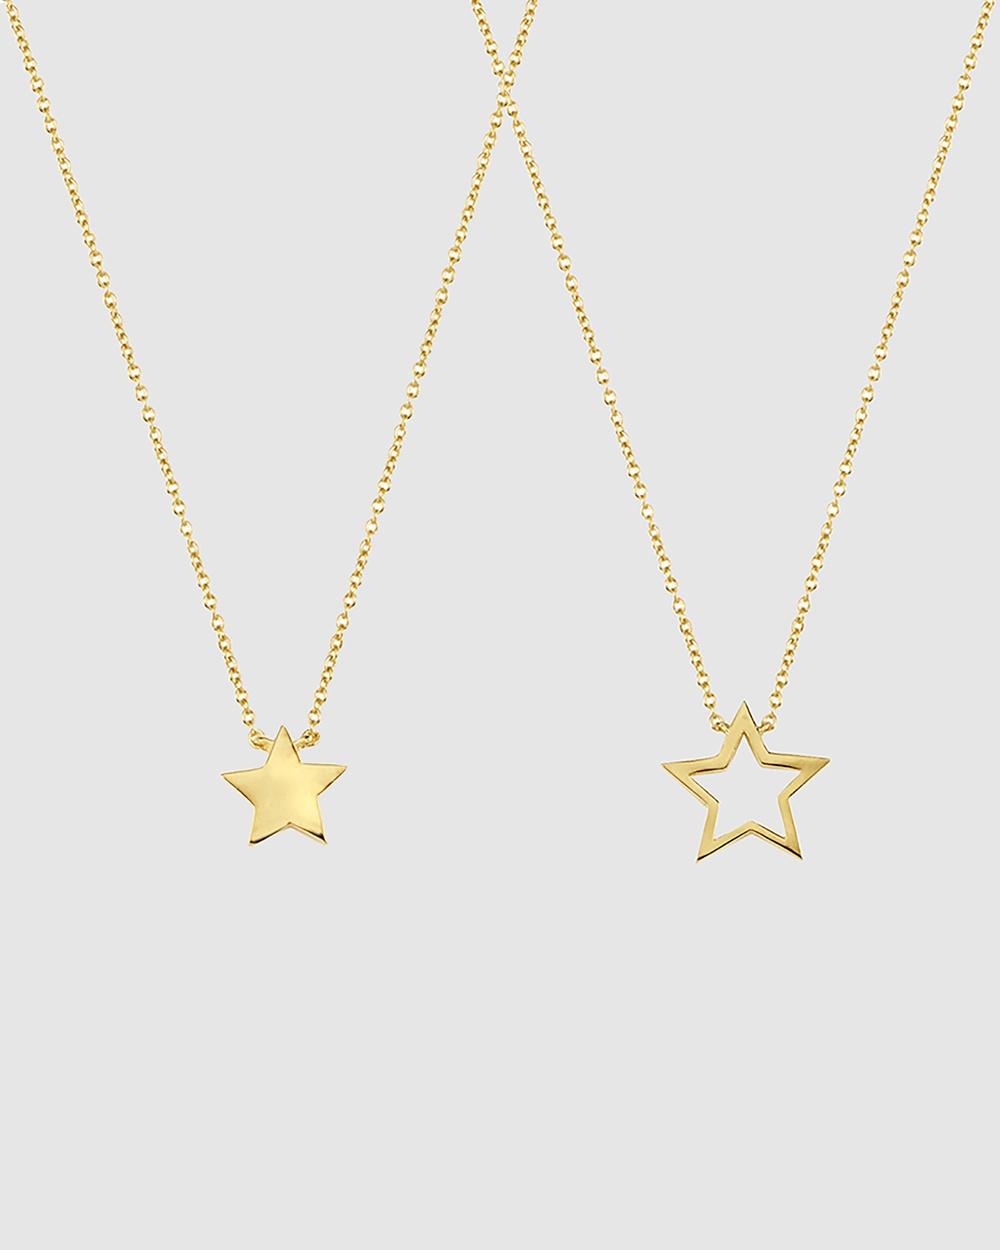 Secret Sisterhood Star Friendship Necklaces Jewellery Gold